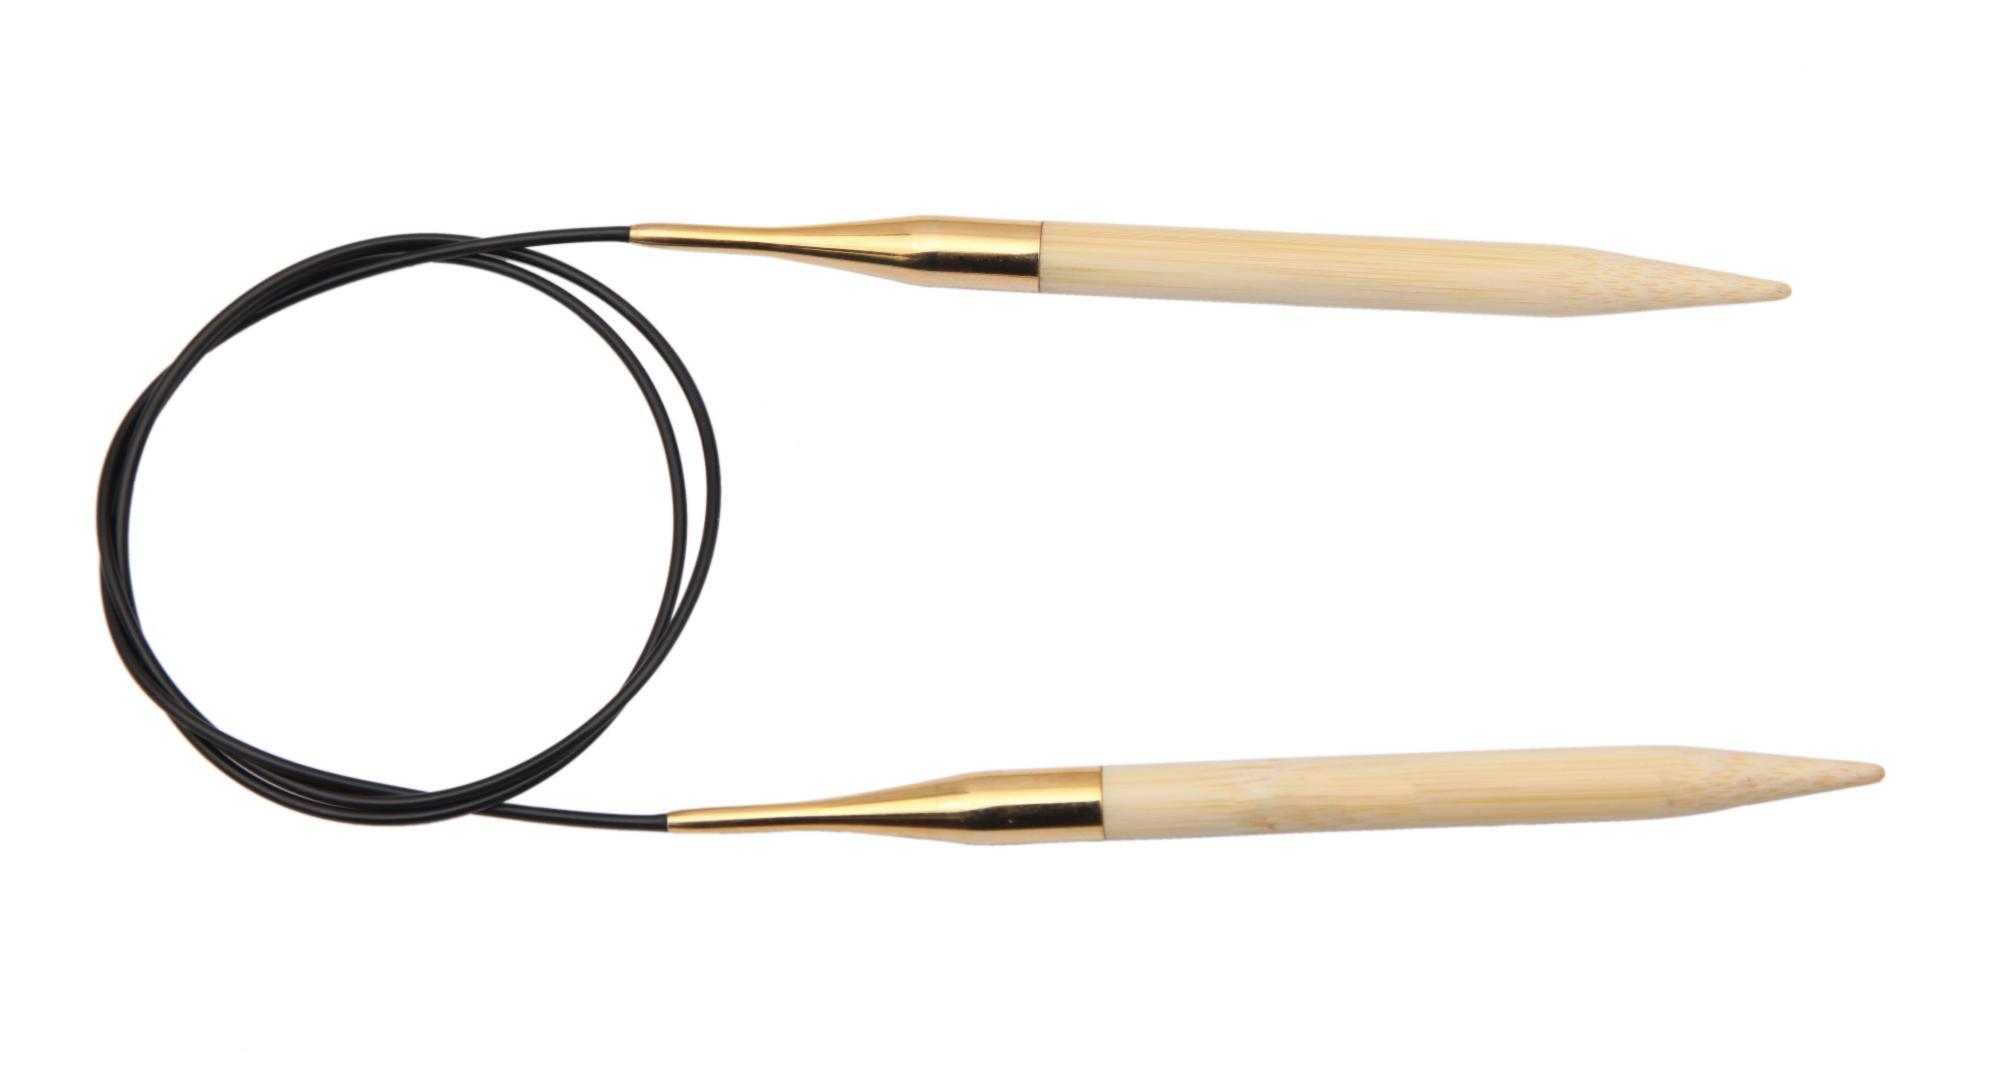 Спицы круговые 80 см Bamboo KnitPro, 22254, 8.00 мм